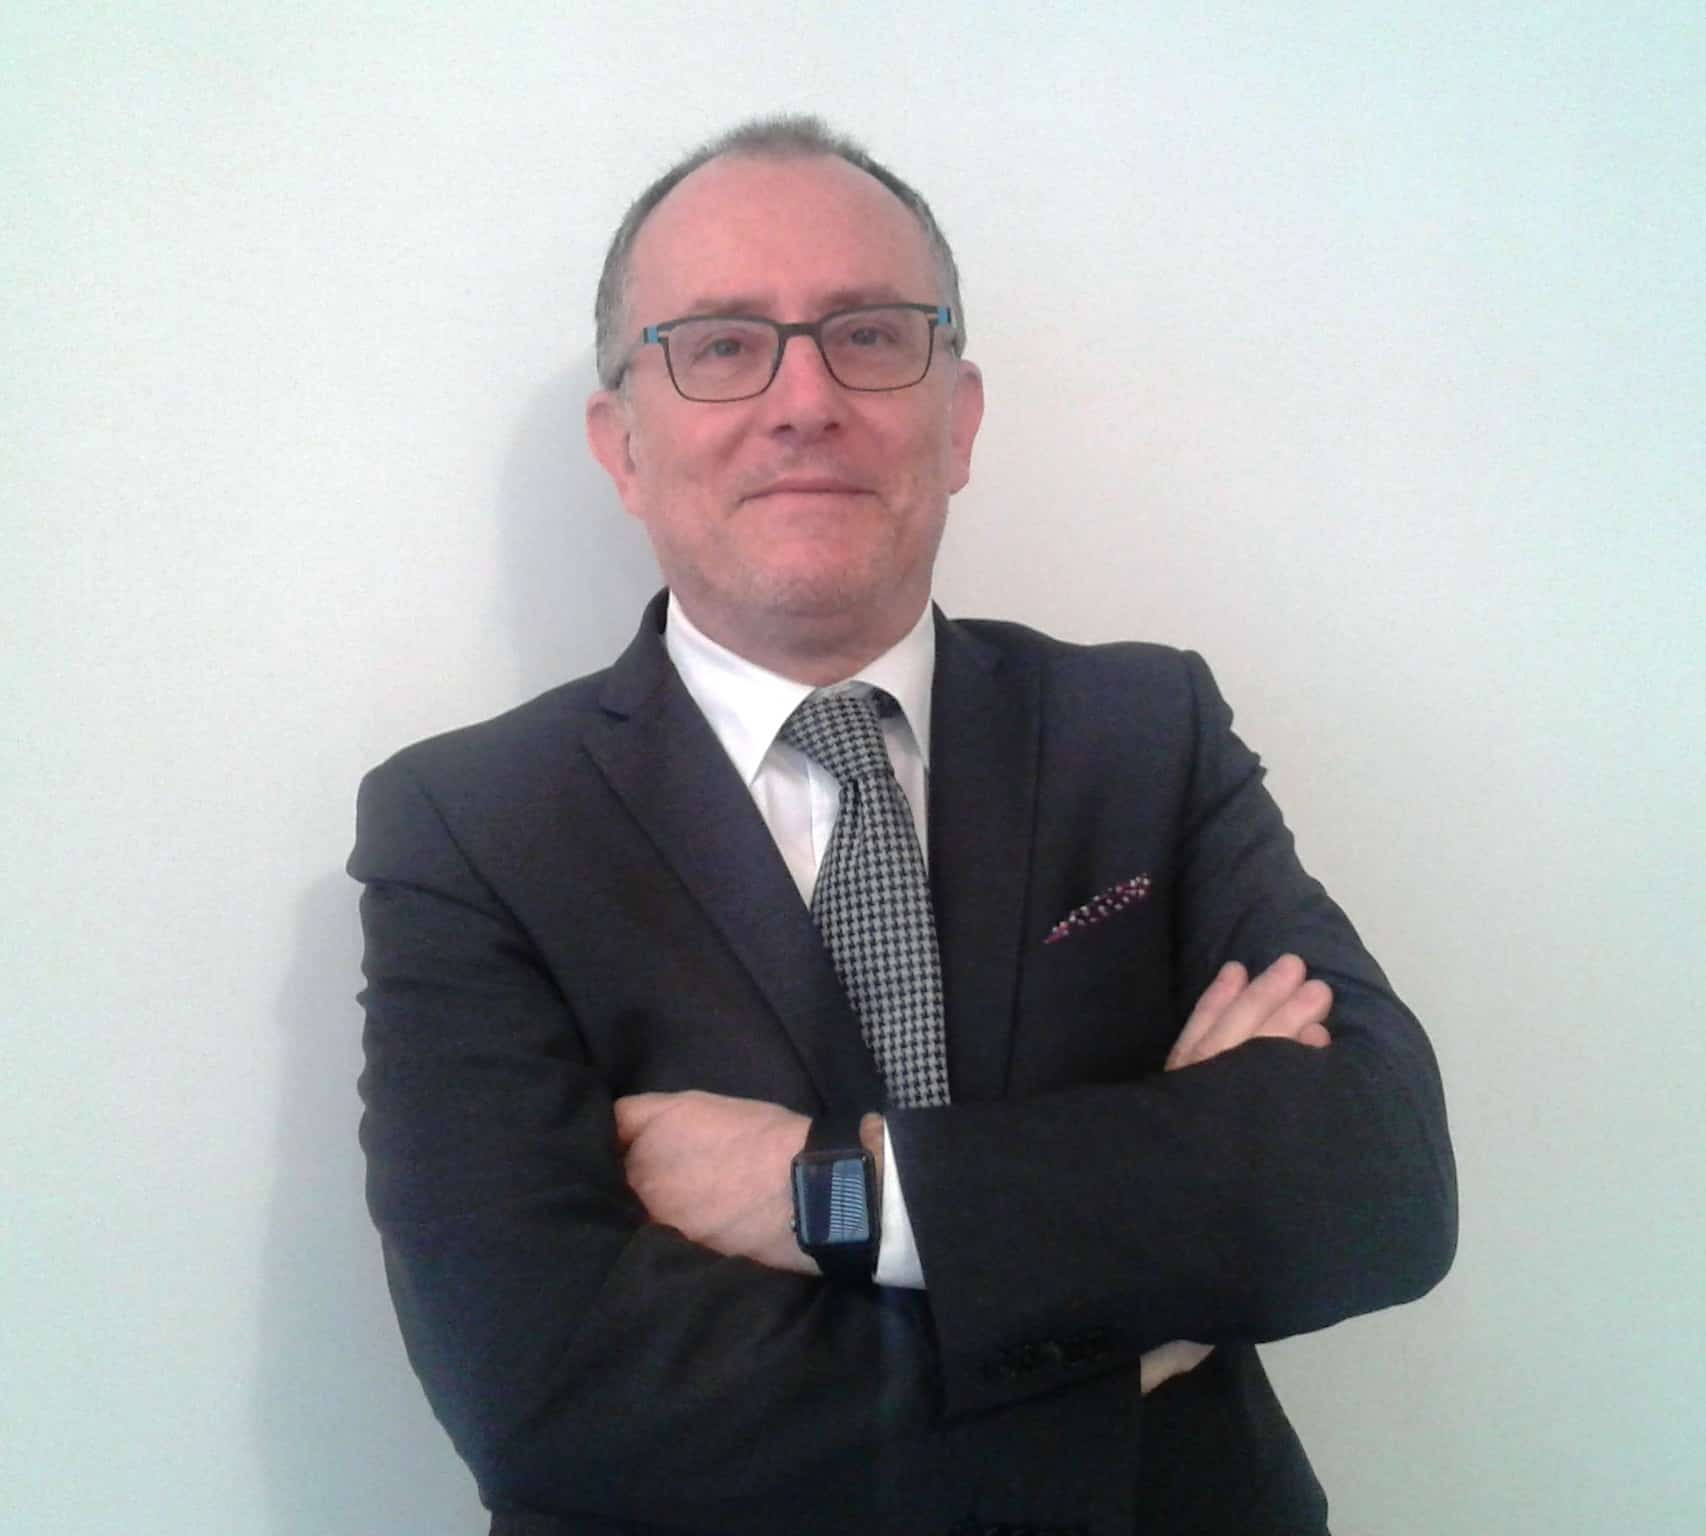 https://digitalmeet.it/wp-content/uploads/2018/10/Tiziano-Barone-Veneto-Lavoro.jpg